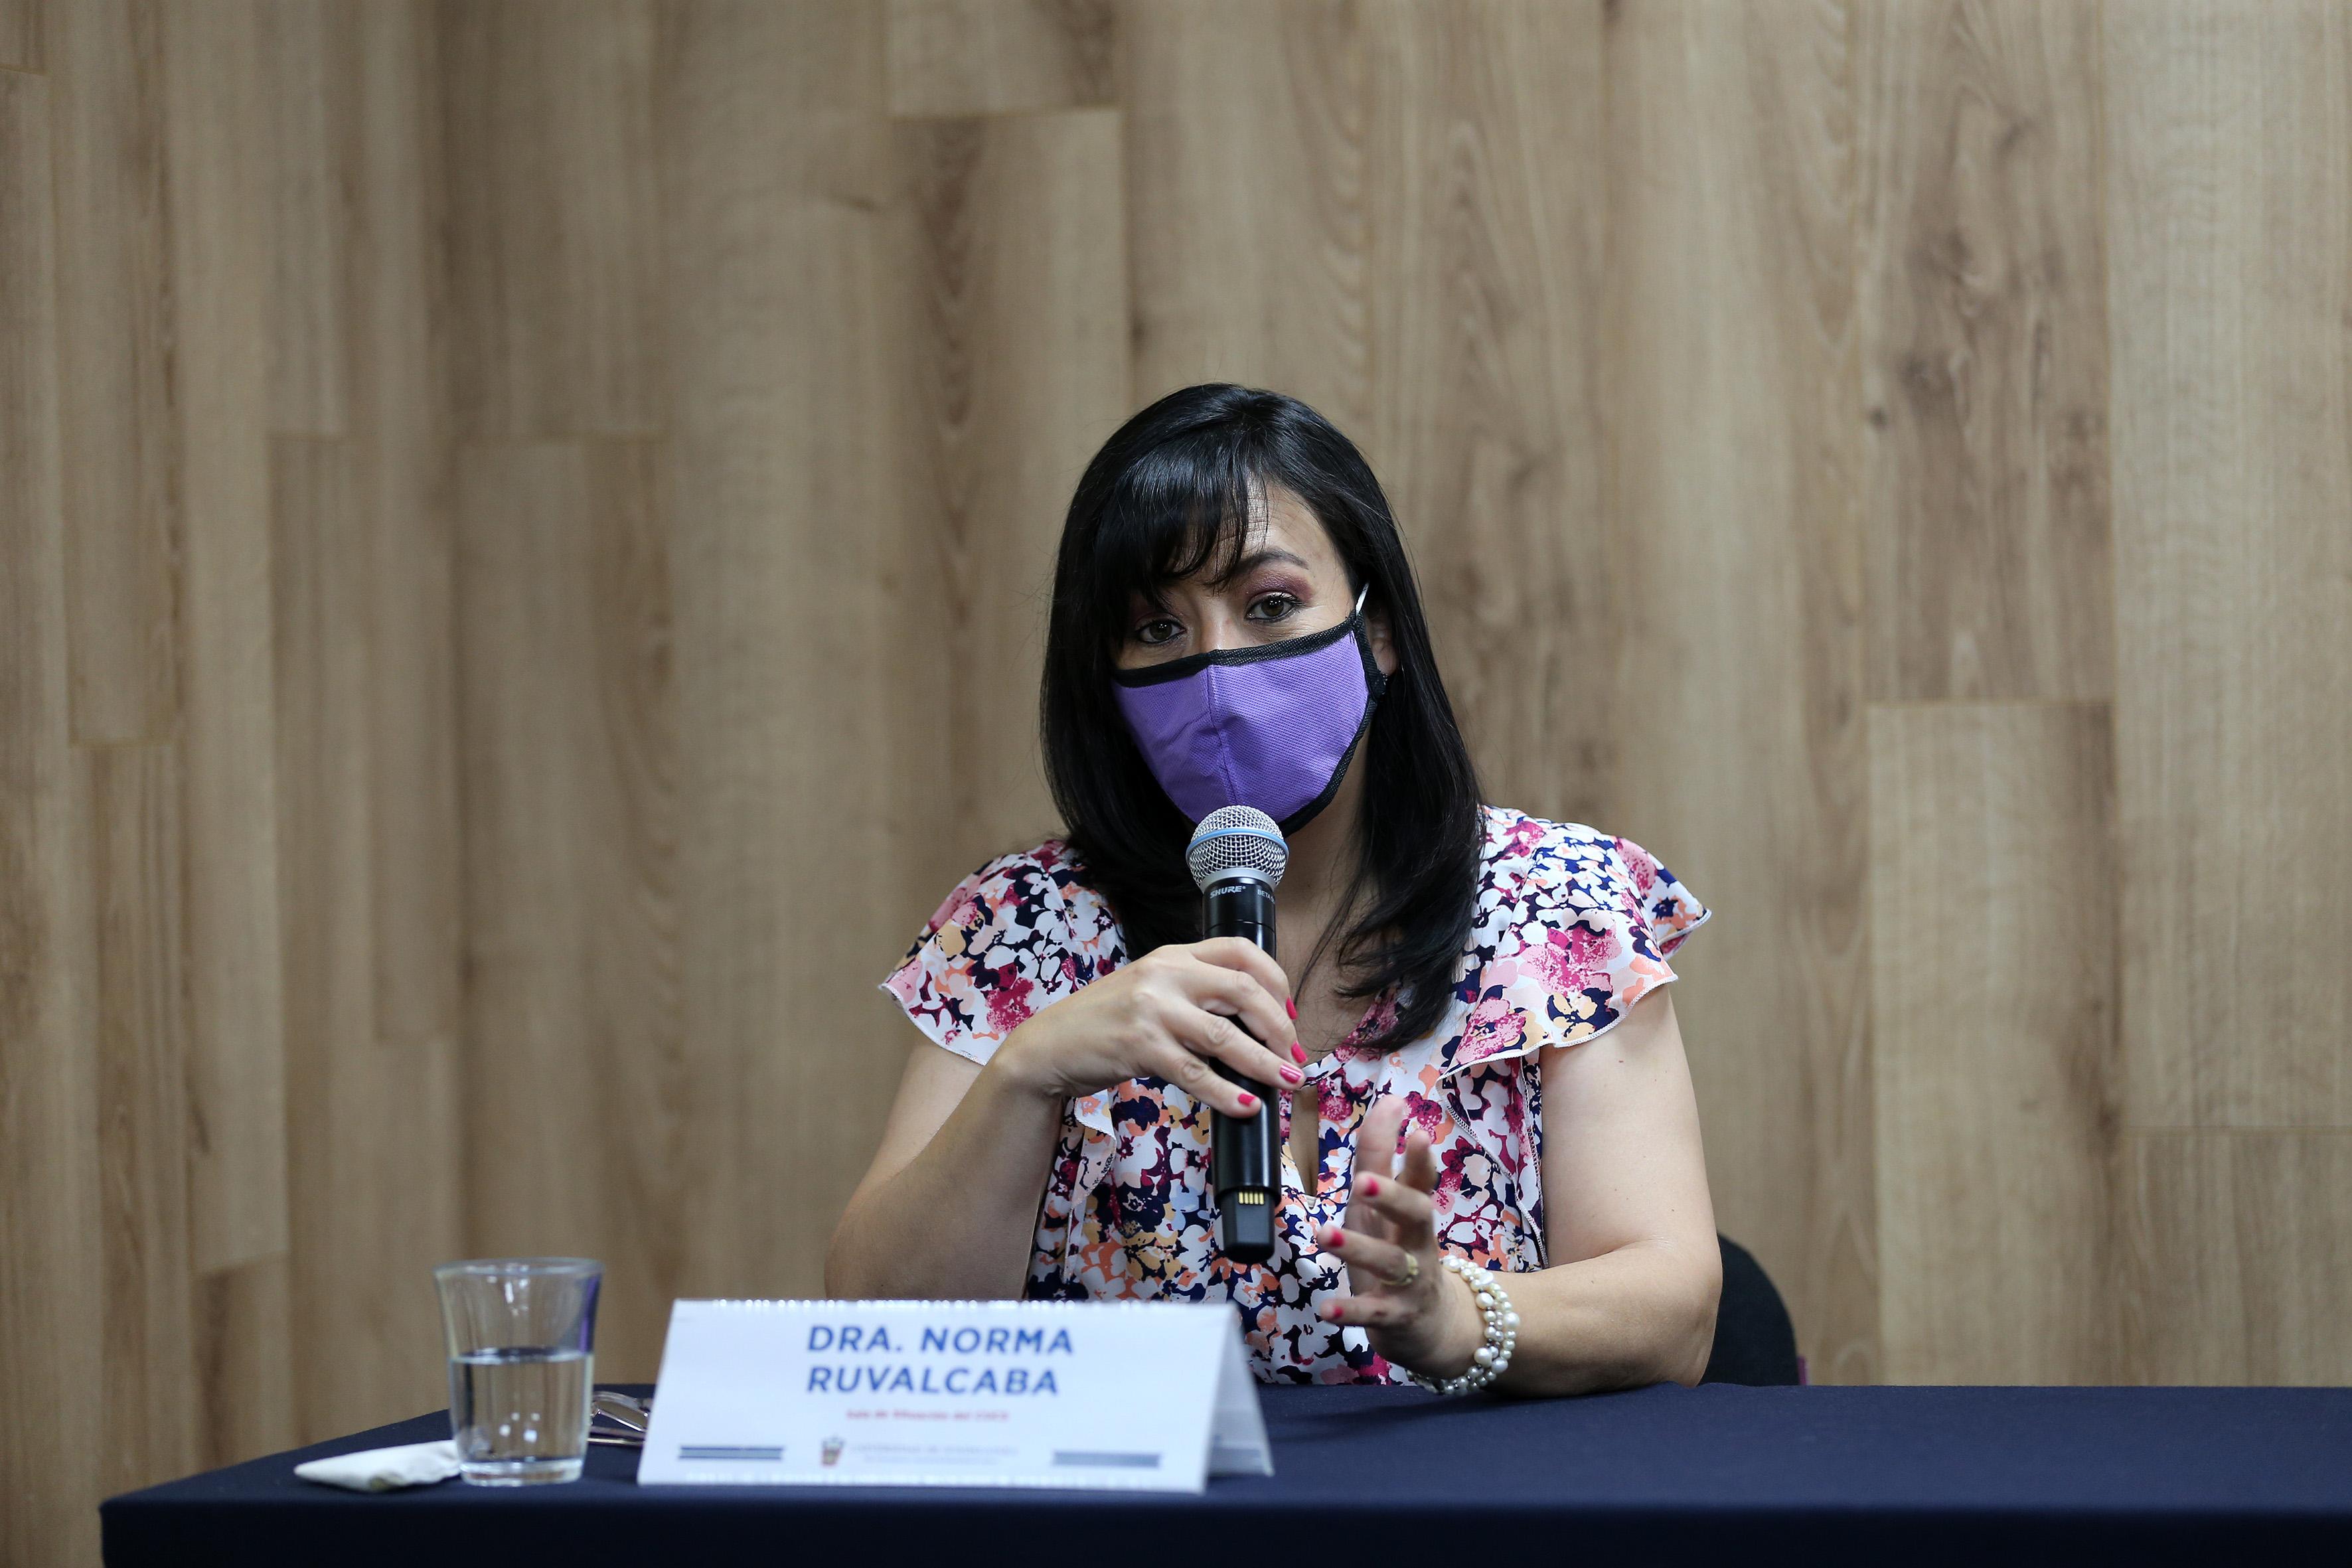 Dra. Norma Ruvalcaba al micrófono